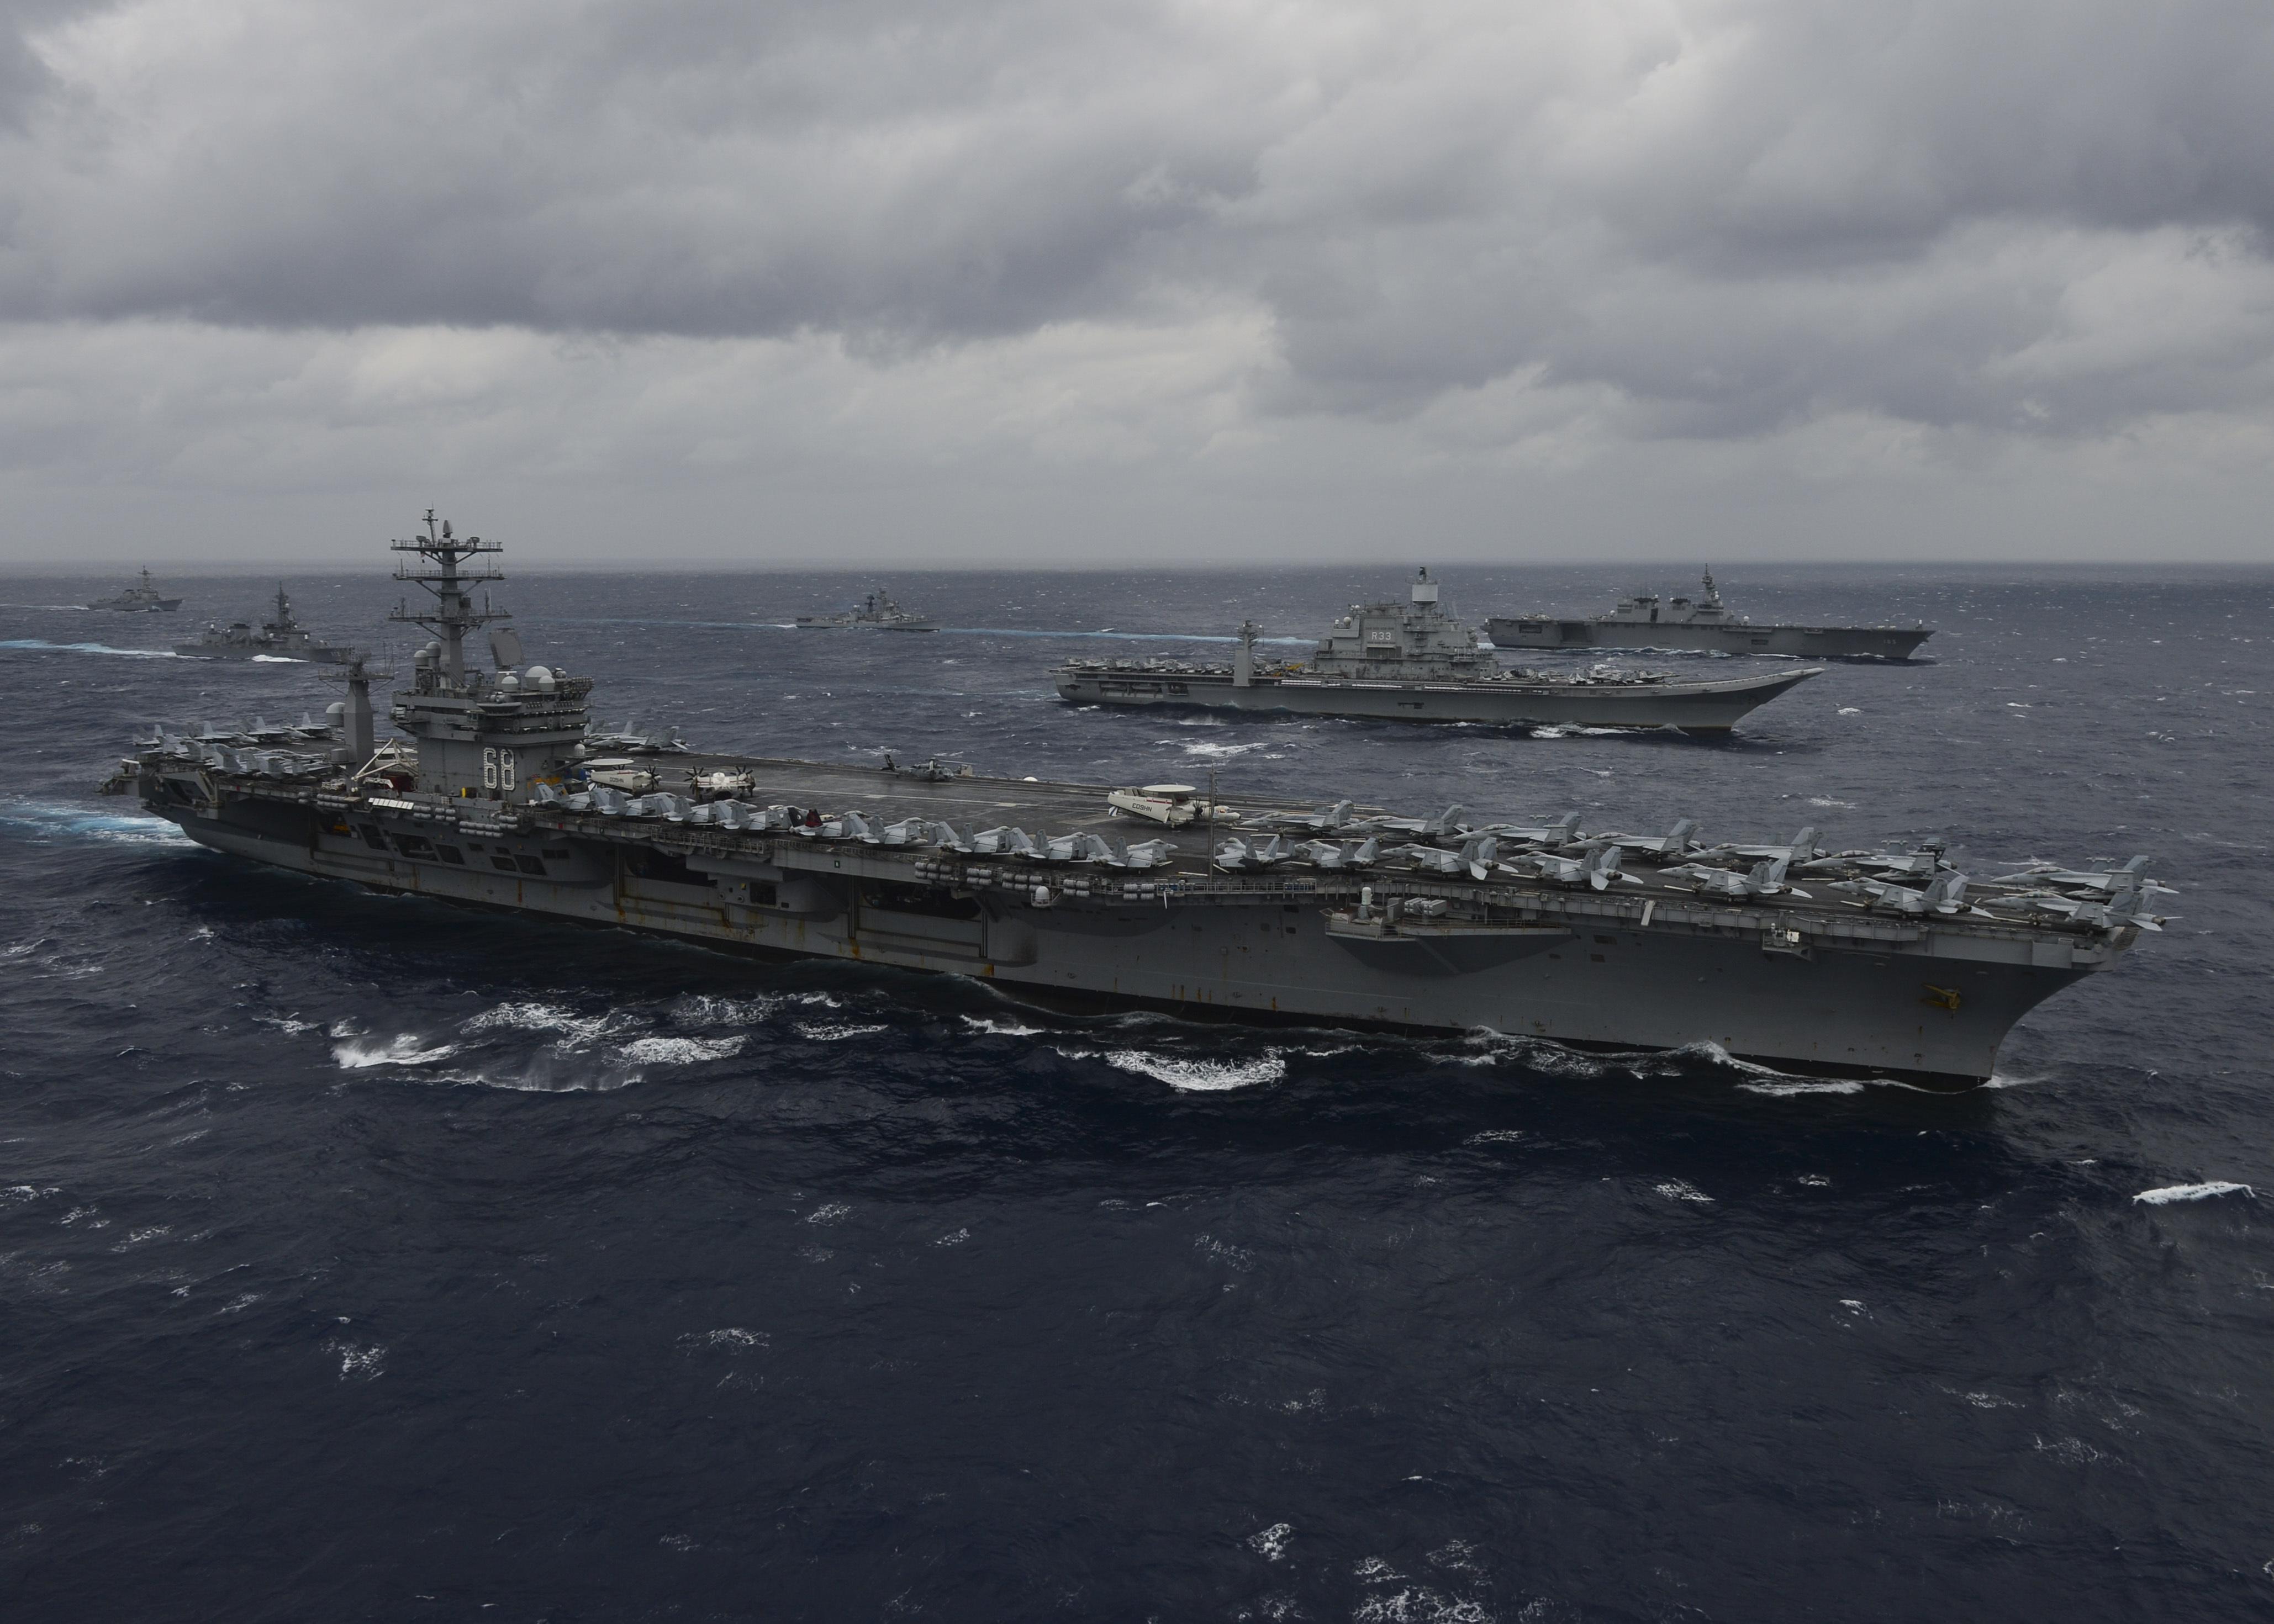 Multinational fleet & exercices 35975443386_4ddb750930_o